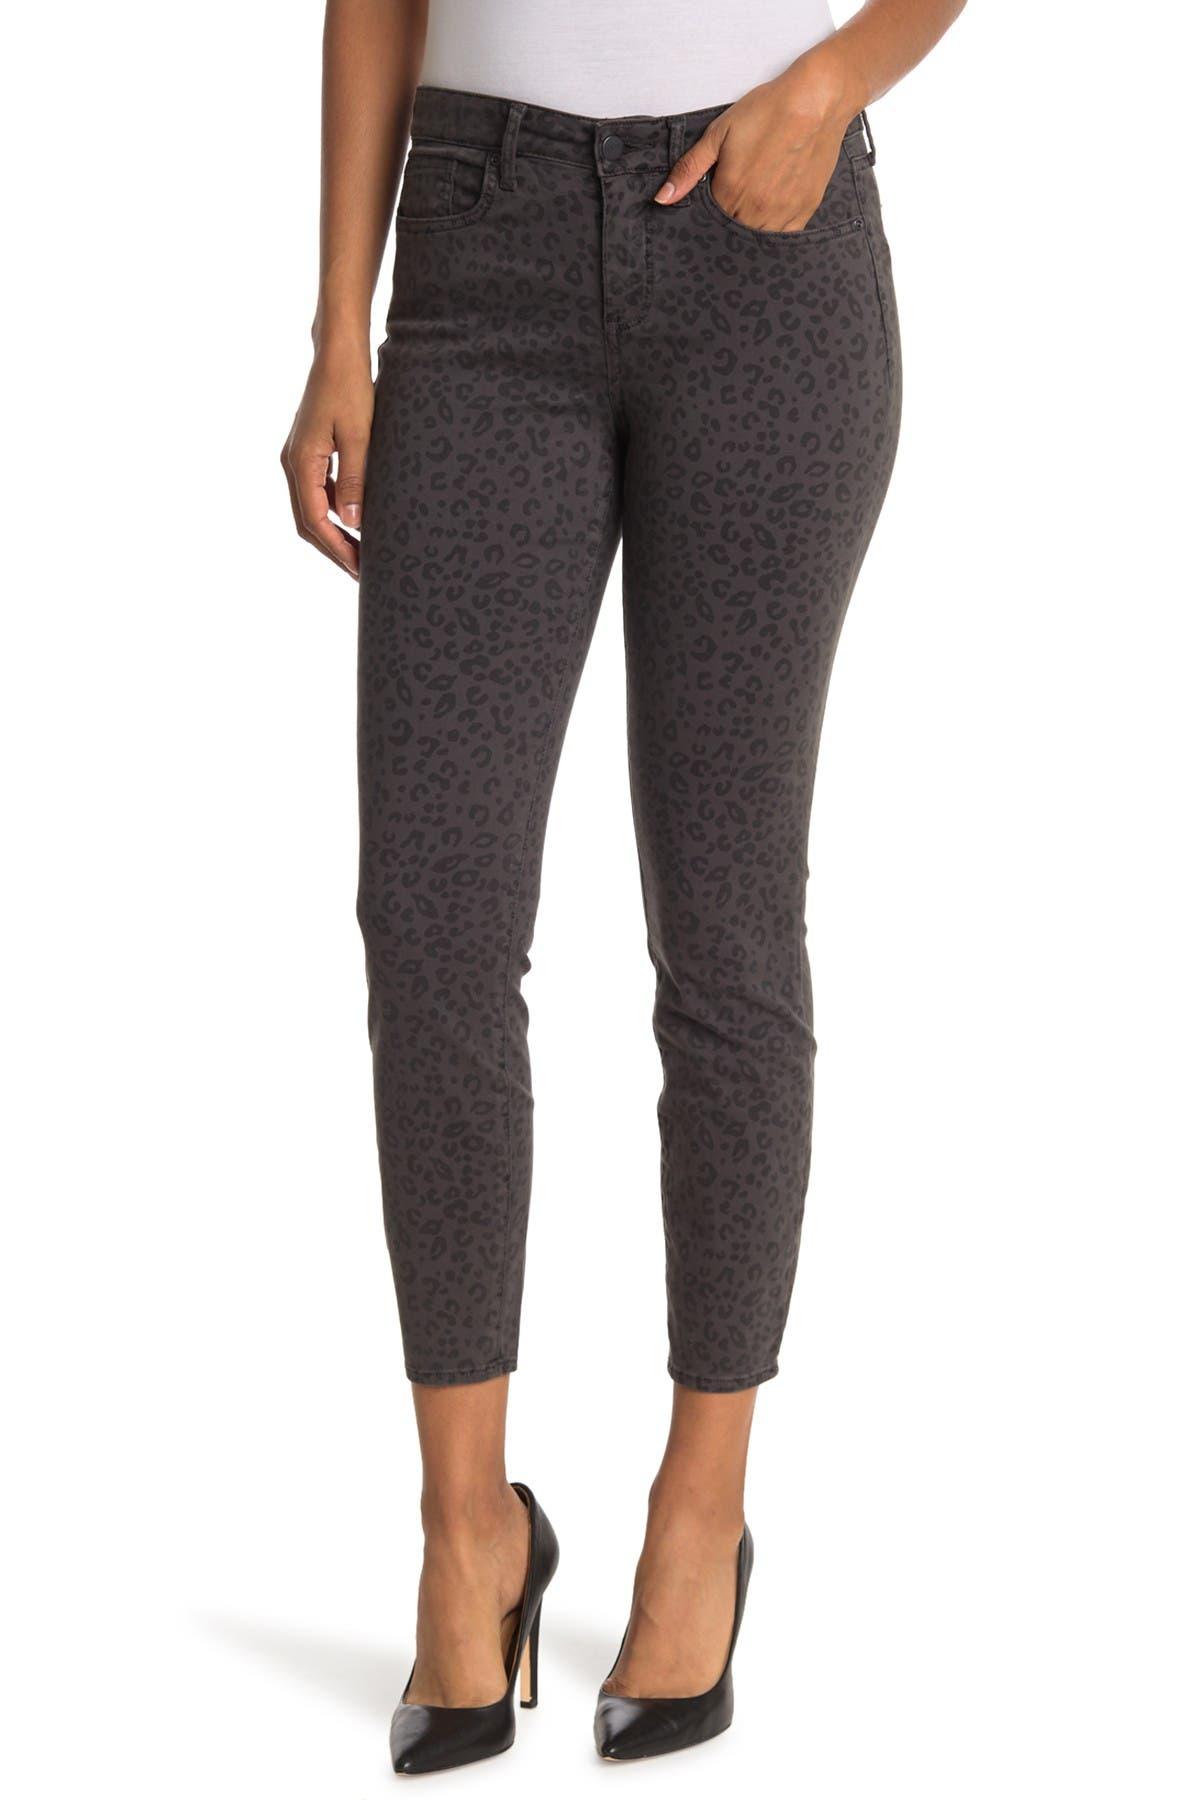 Image of NYDJ Ami Leopard Print Skinny Jeans